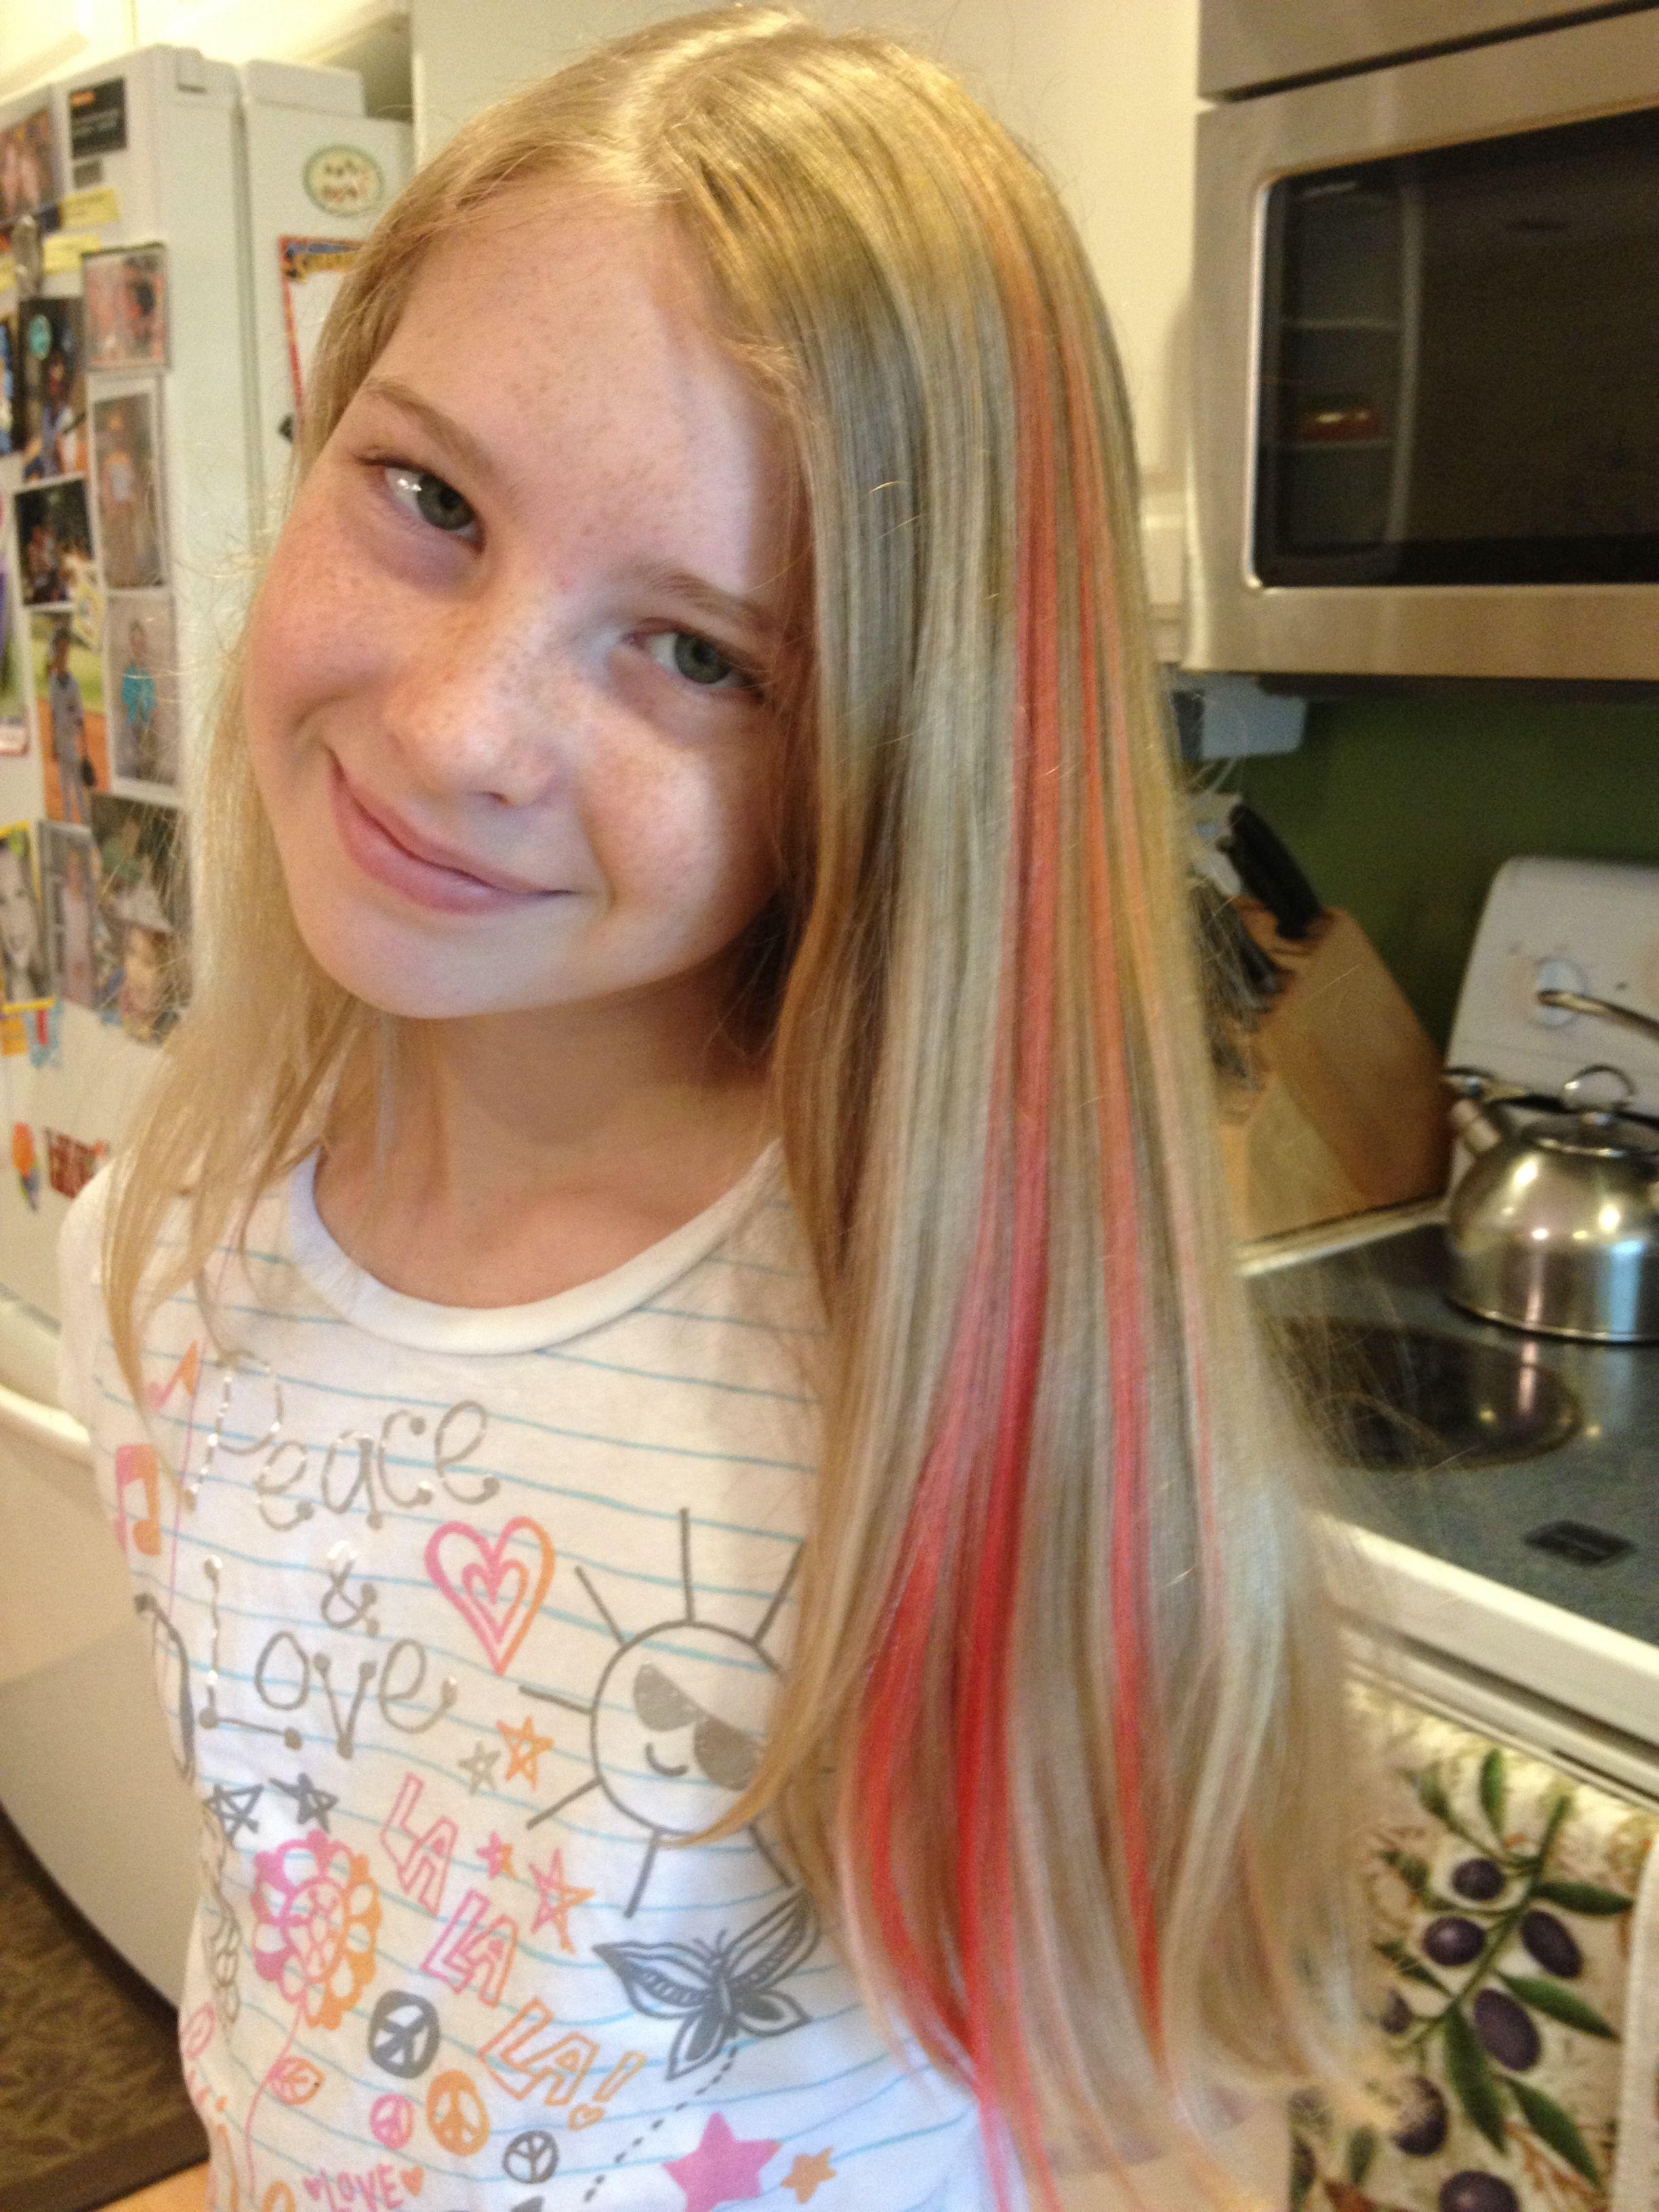 Pin By Barbara Ann On Kool Aid For Hair Dye Hair Dye For Kids Kool Aid Hair Dye Hair Today Gone Tomorrow